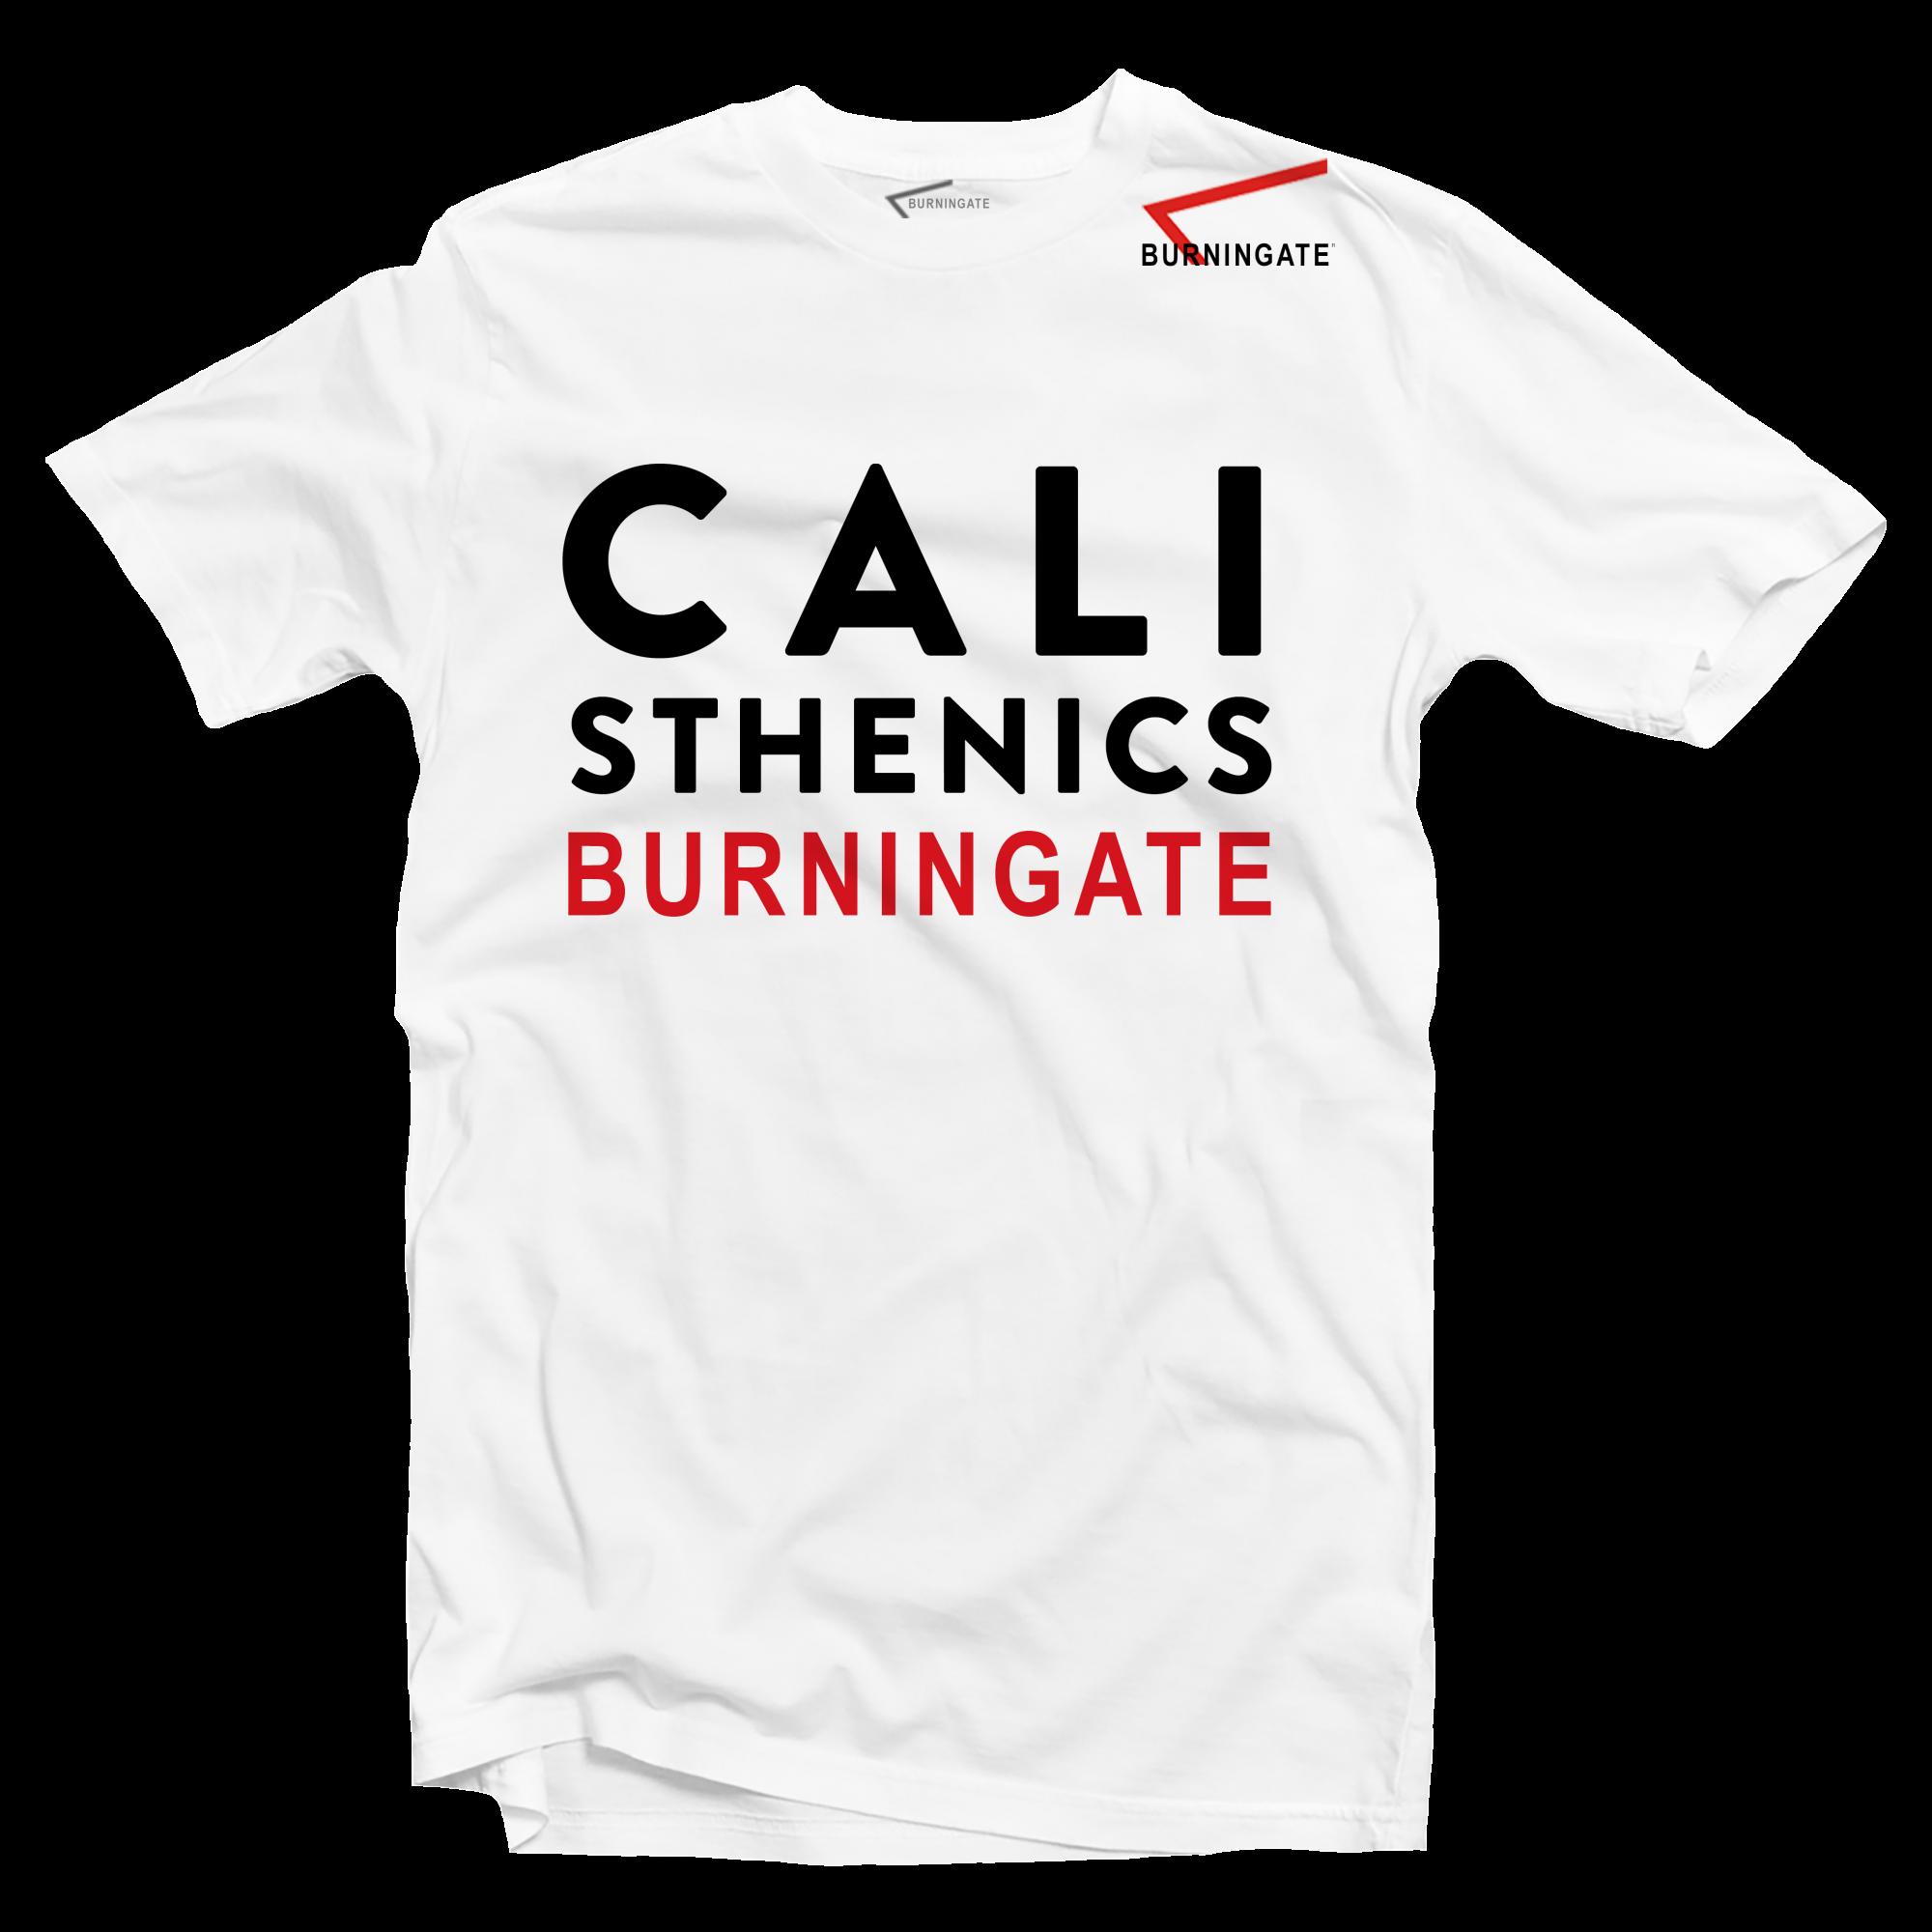 Top T-SHIRT CALISTHENICS MAN | Burningate Shop PU92